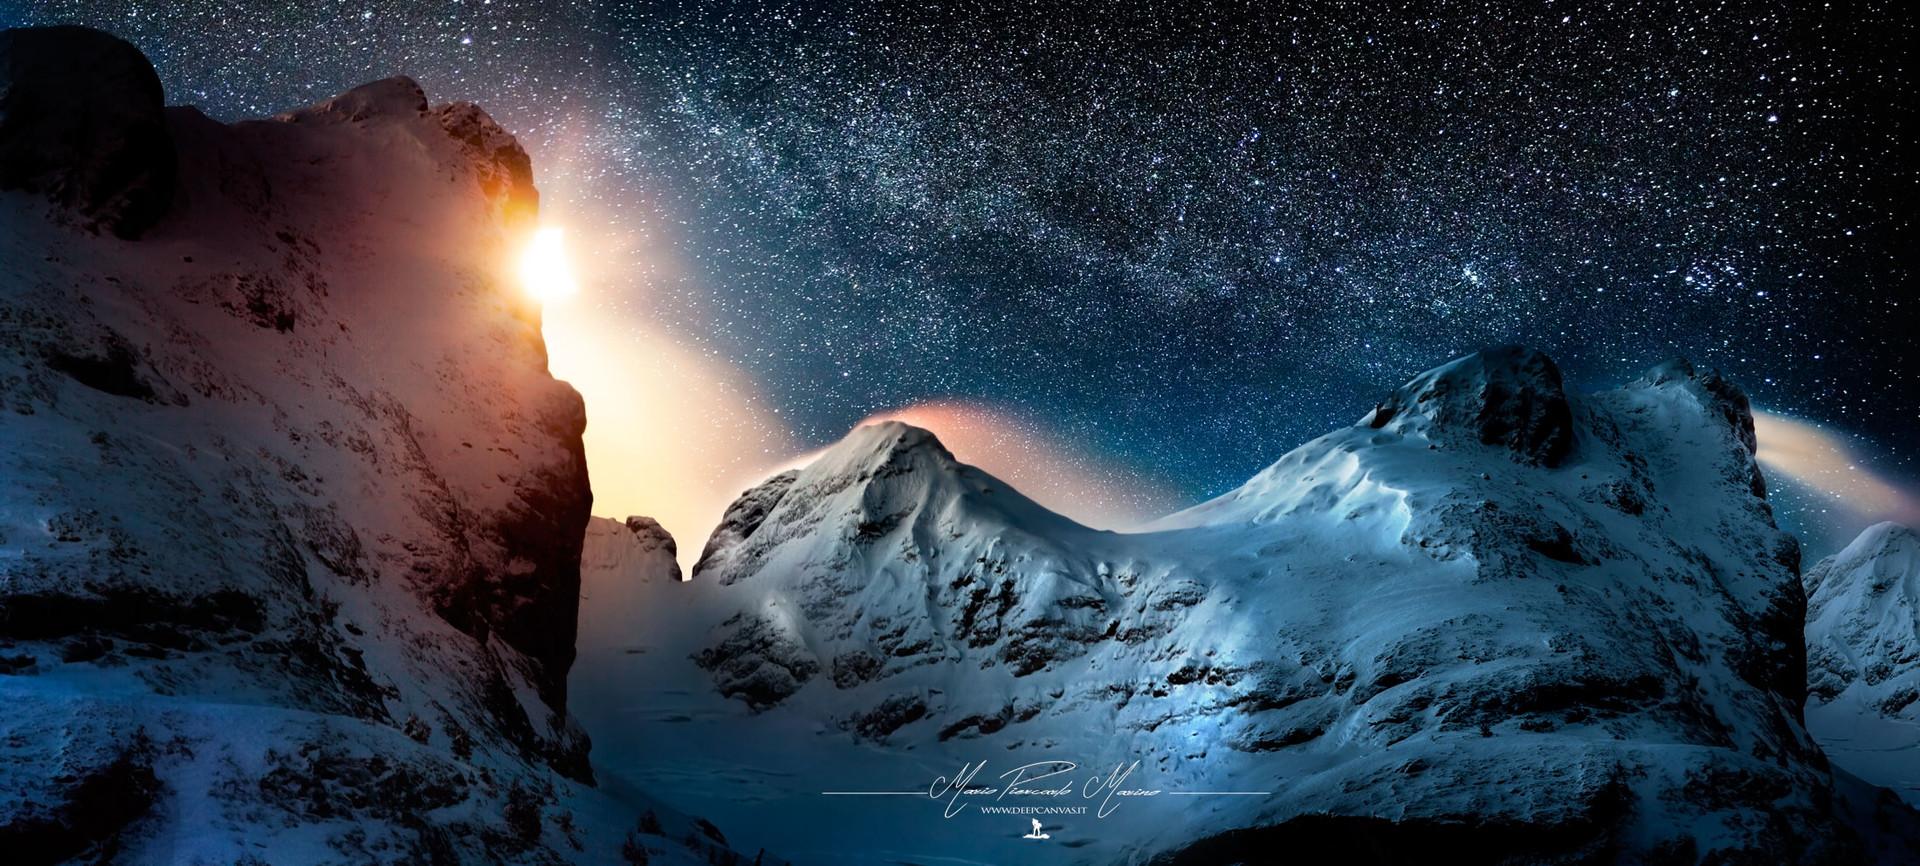 Moon on Mountain Marmolada photo by Mario Piercarlo Marino